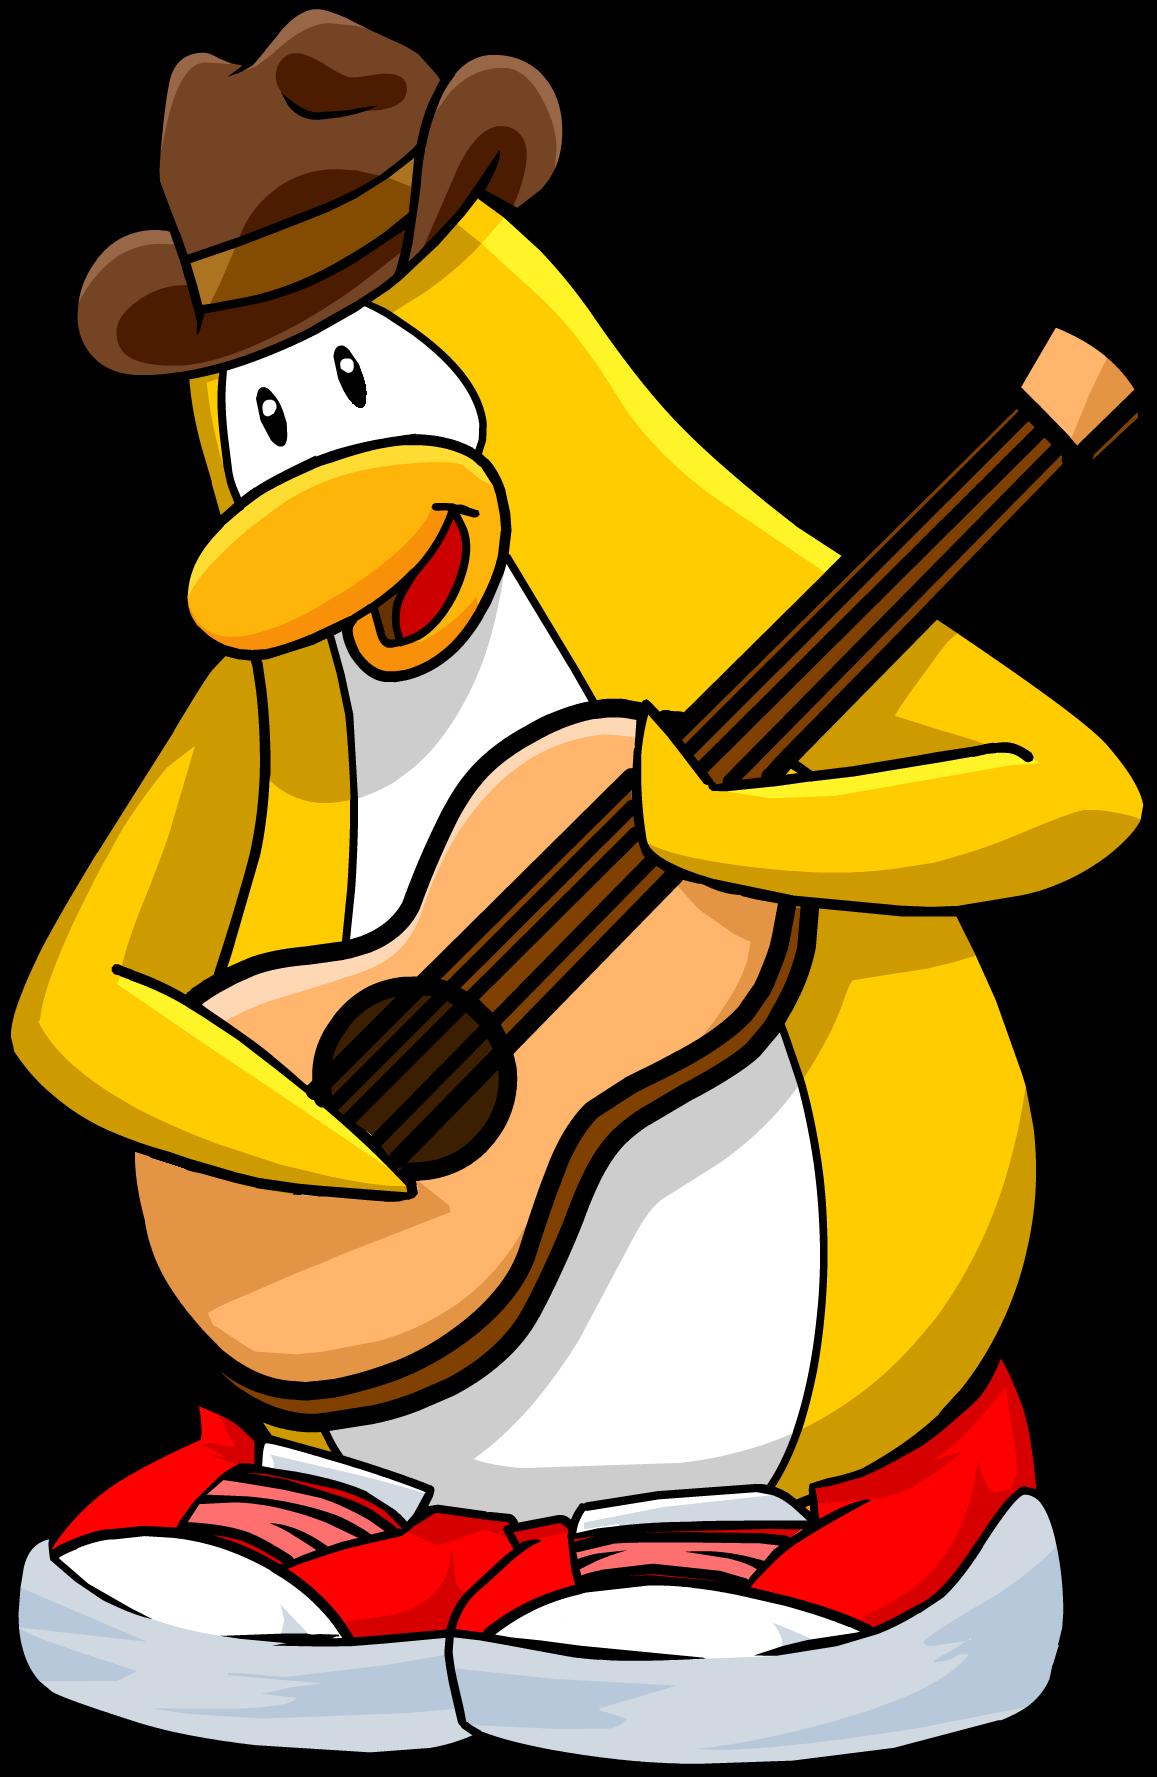 Franky's Guitar